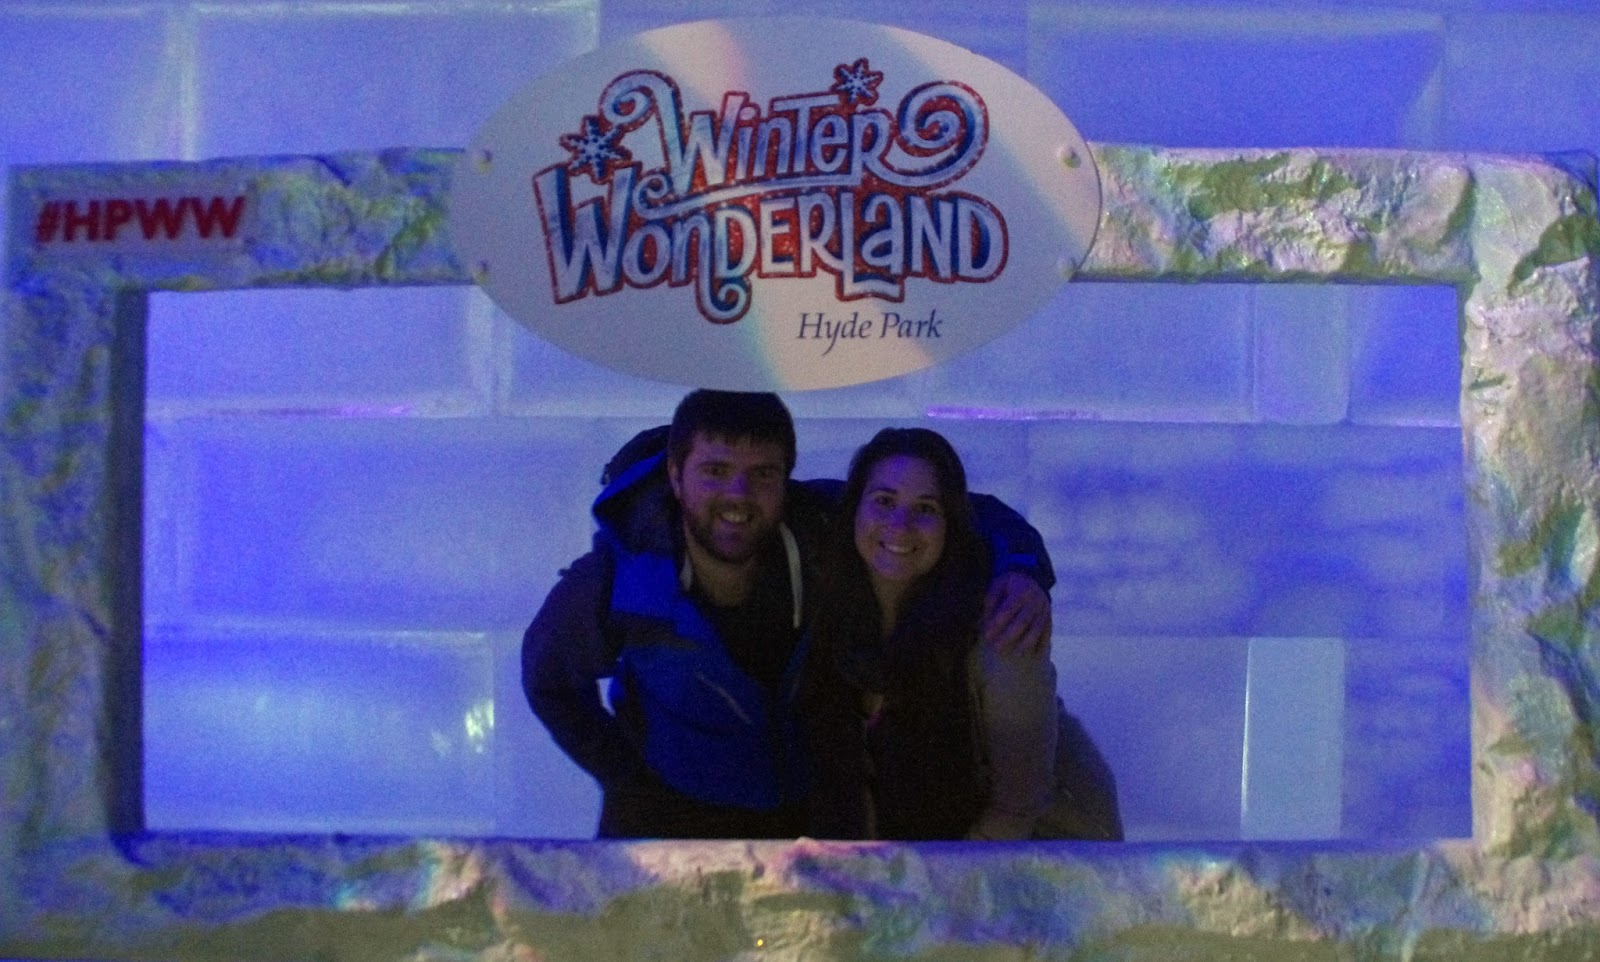 Winter Wonderland Hyde Park Magical Ice Kingdom